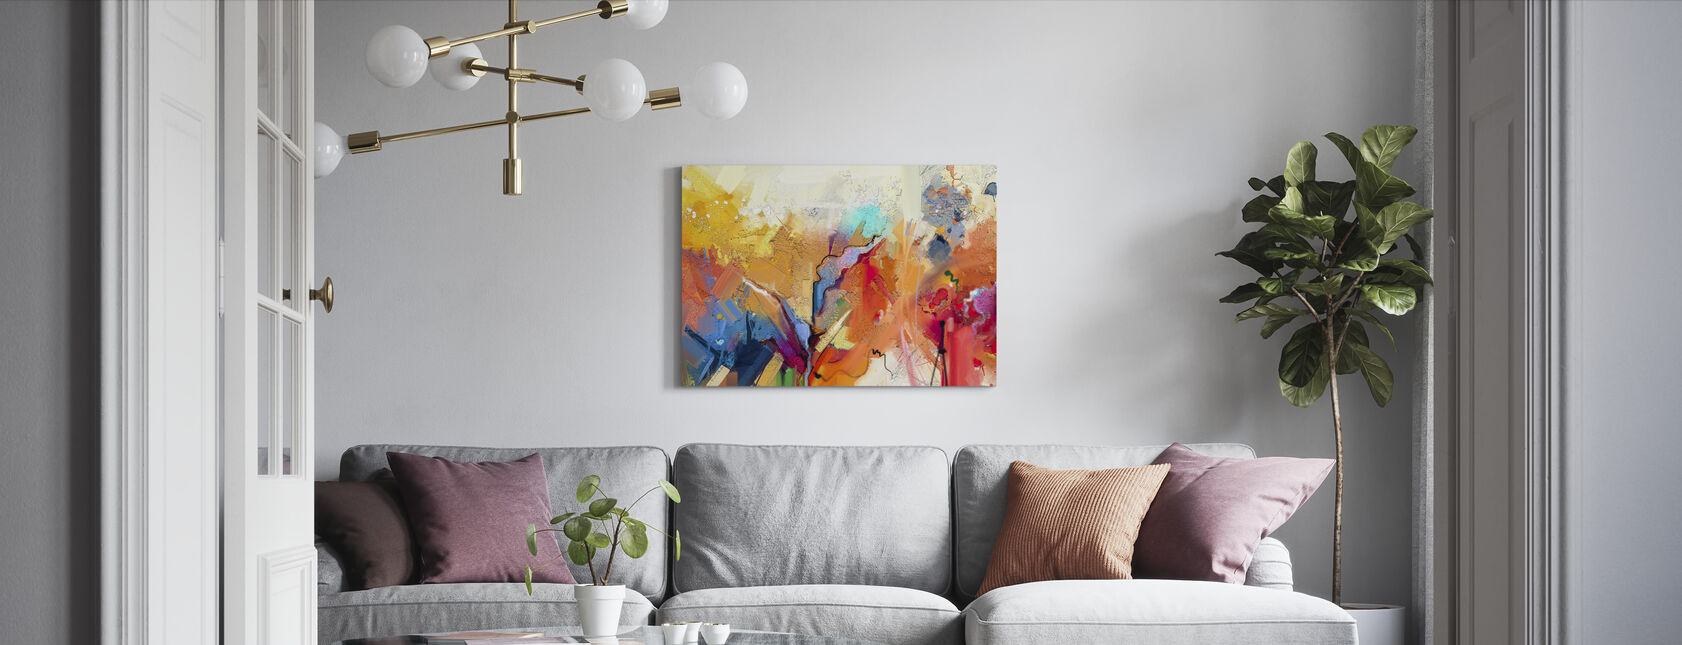 Fargerik abstrakt maleri - Lerretsbilde - Stue